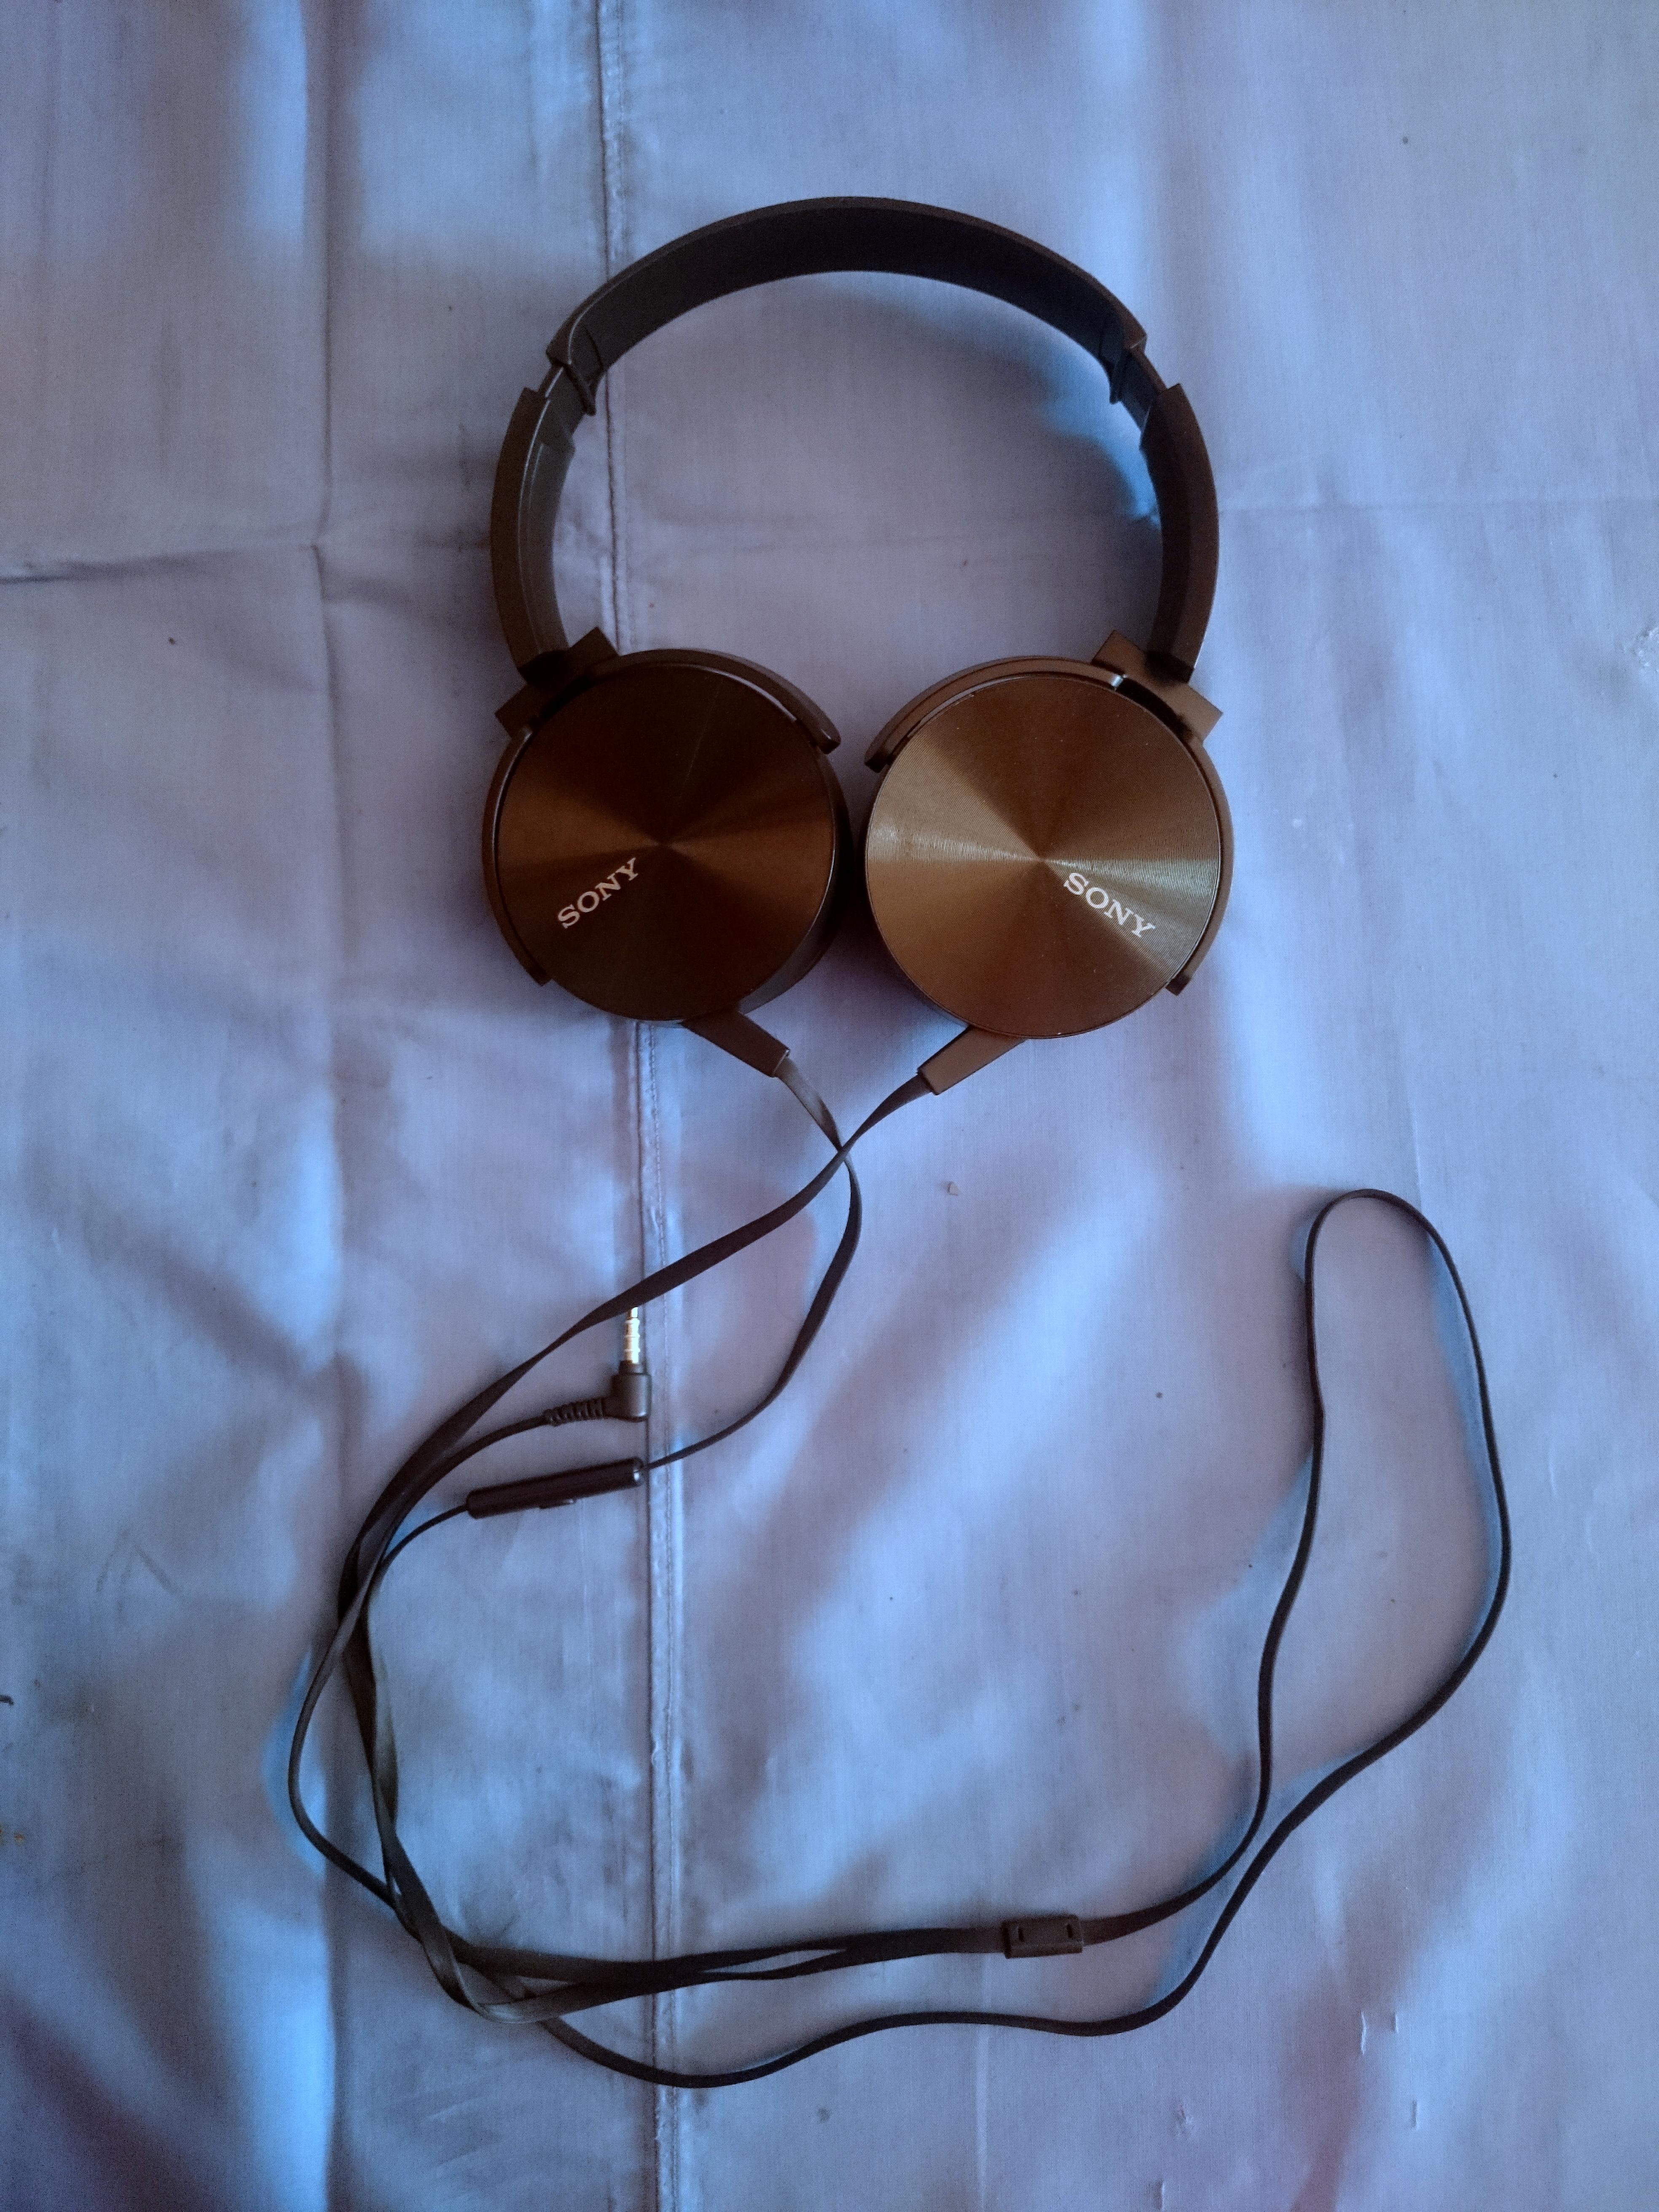 Sony Headset, Brand, Electronic, Equipment, Handsfree, HQ Photo